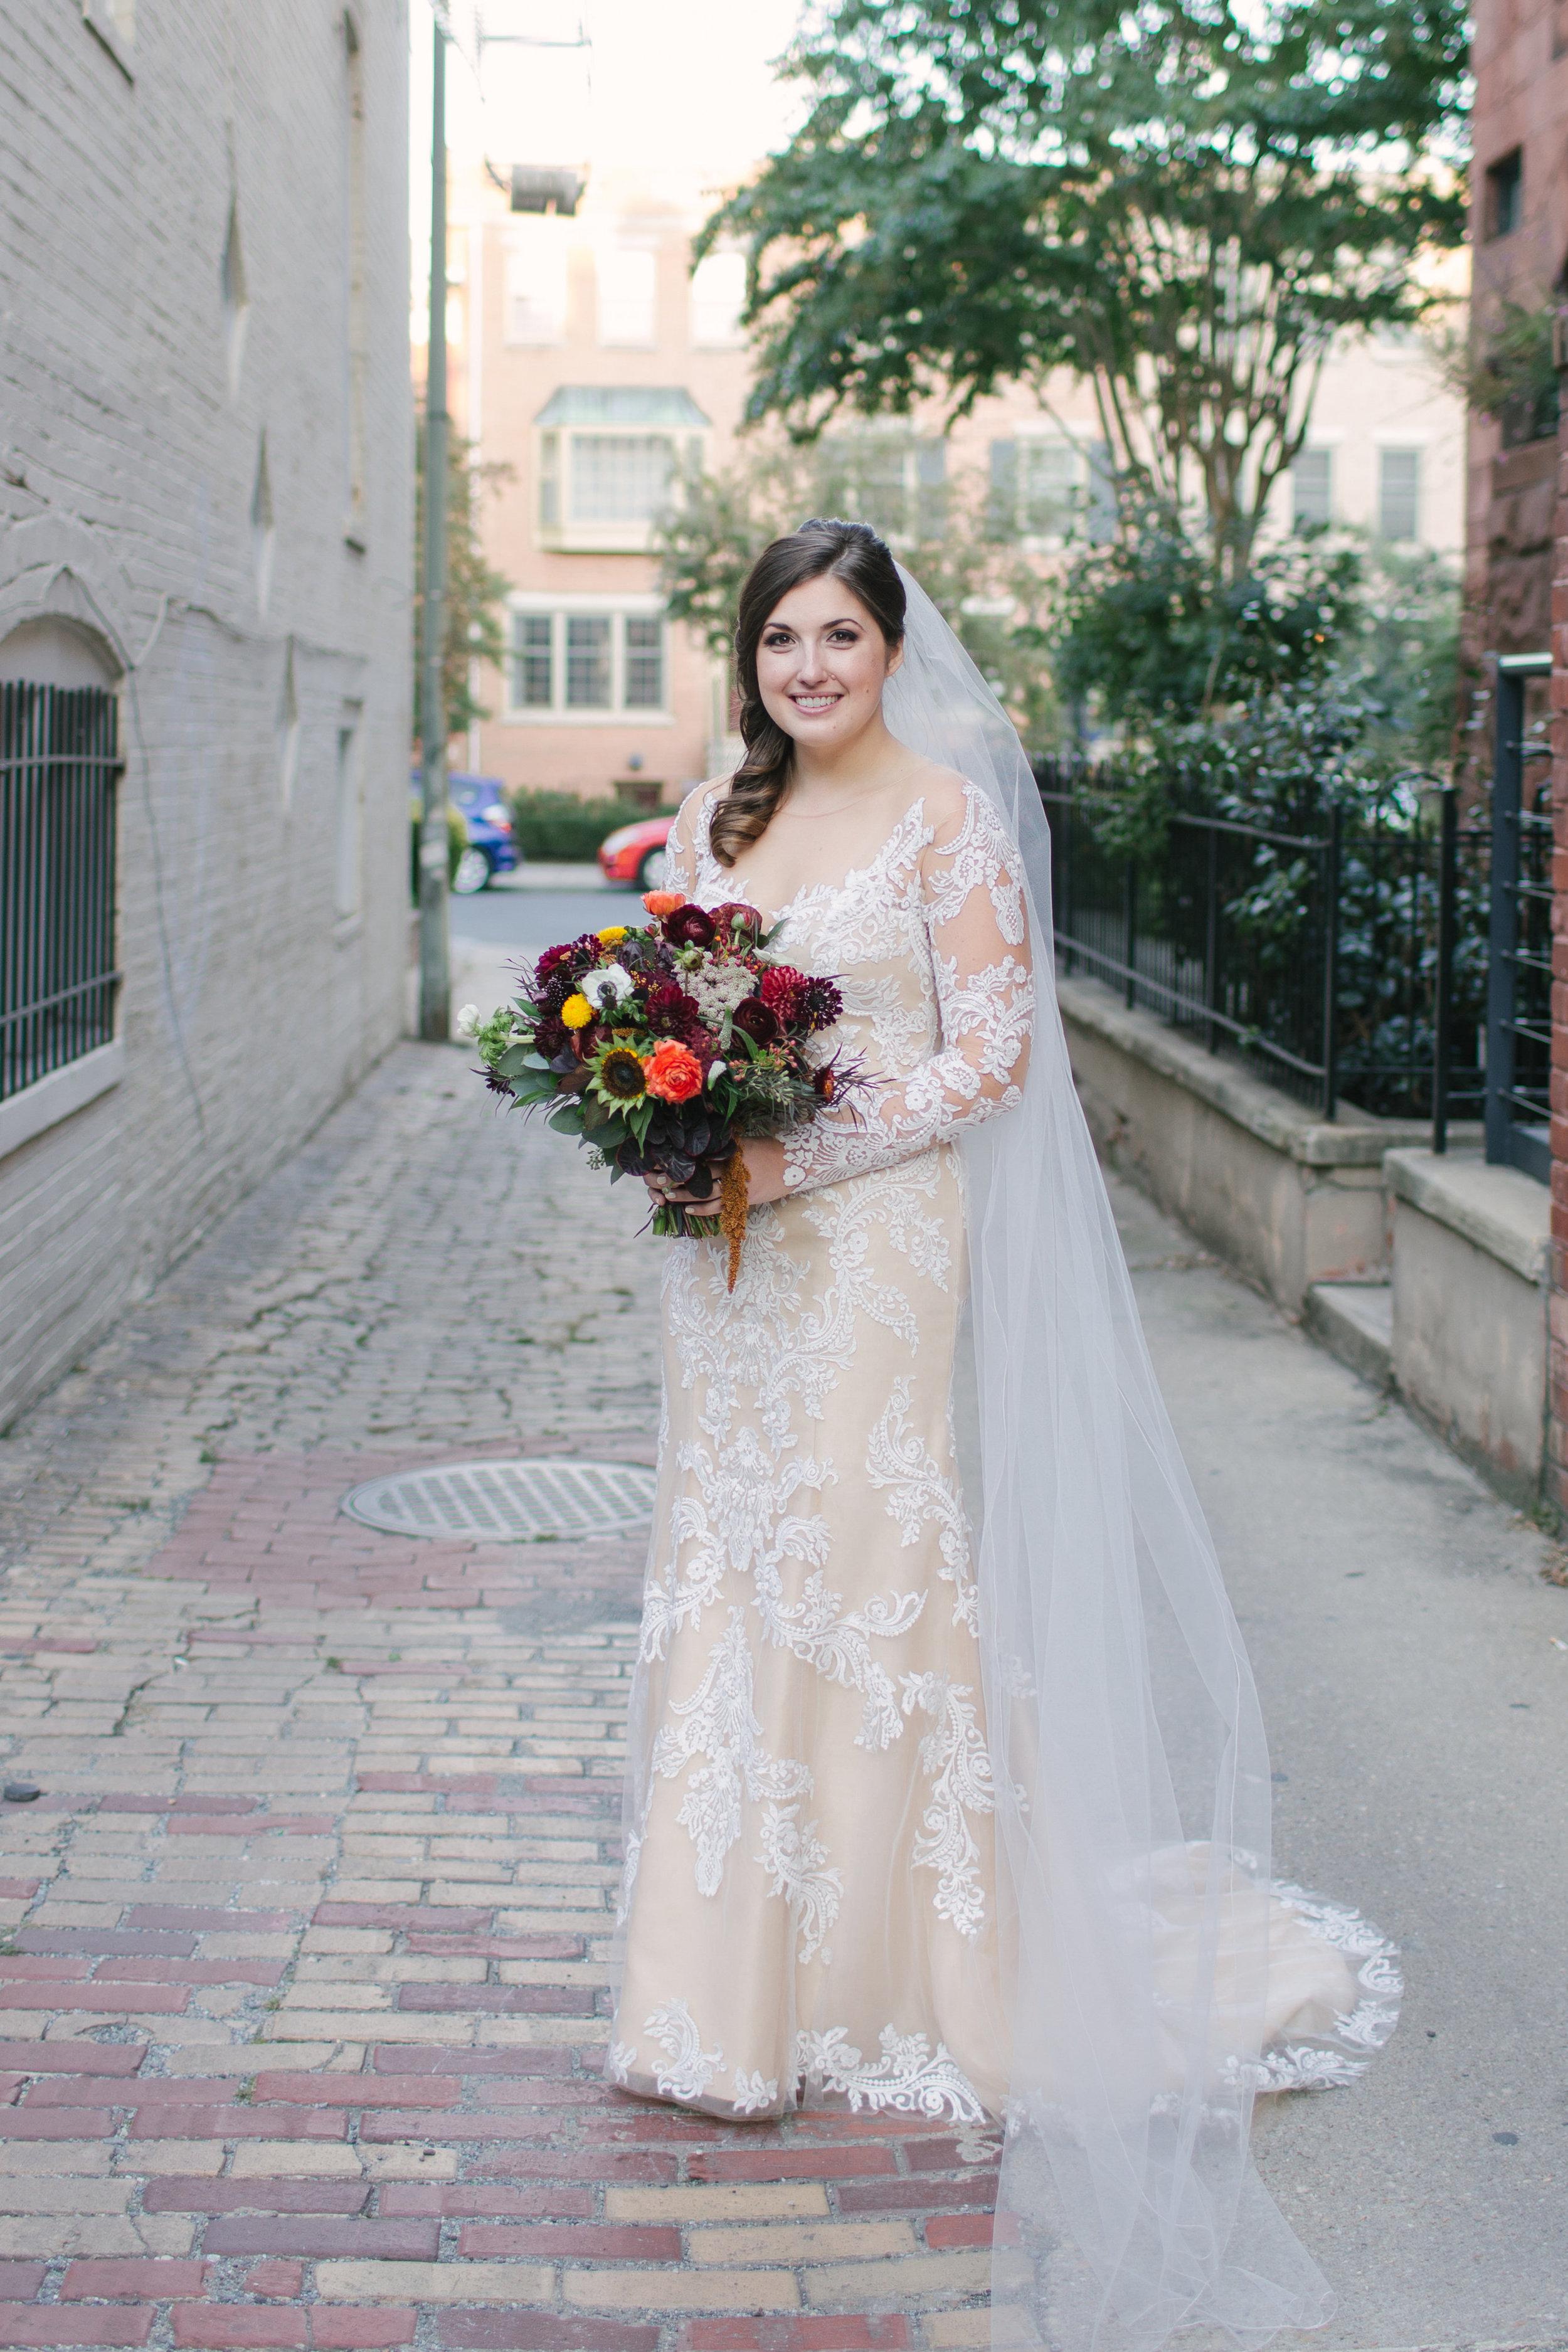 Dupon Circle Wedding | Washington DC Wedding Photography | Rebecca Wilcher Photography -13.jpg